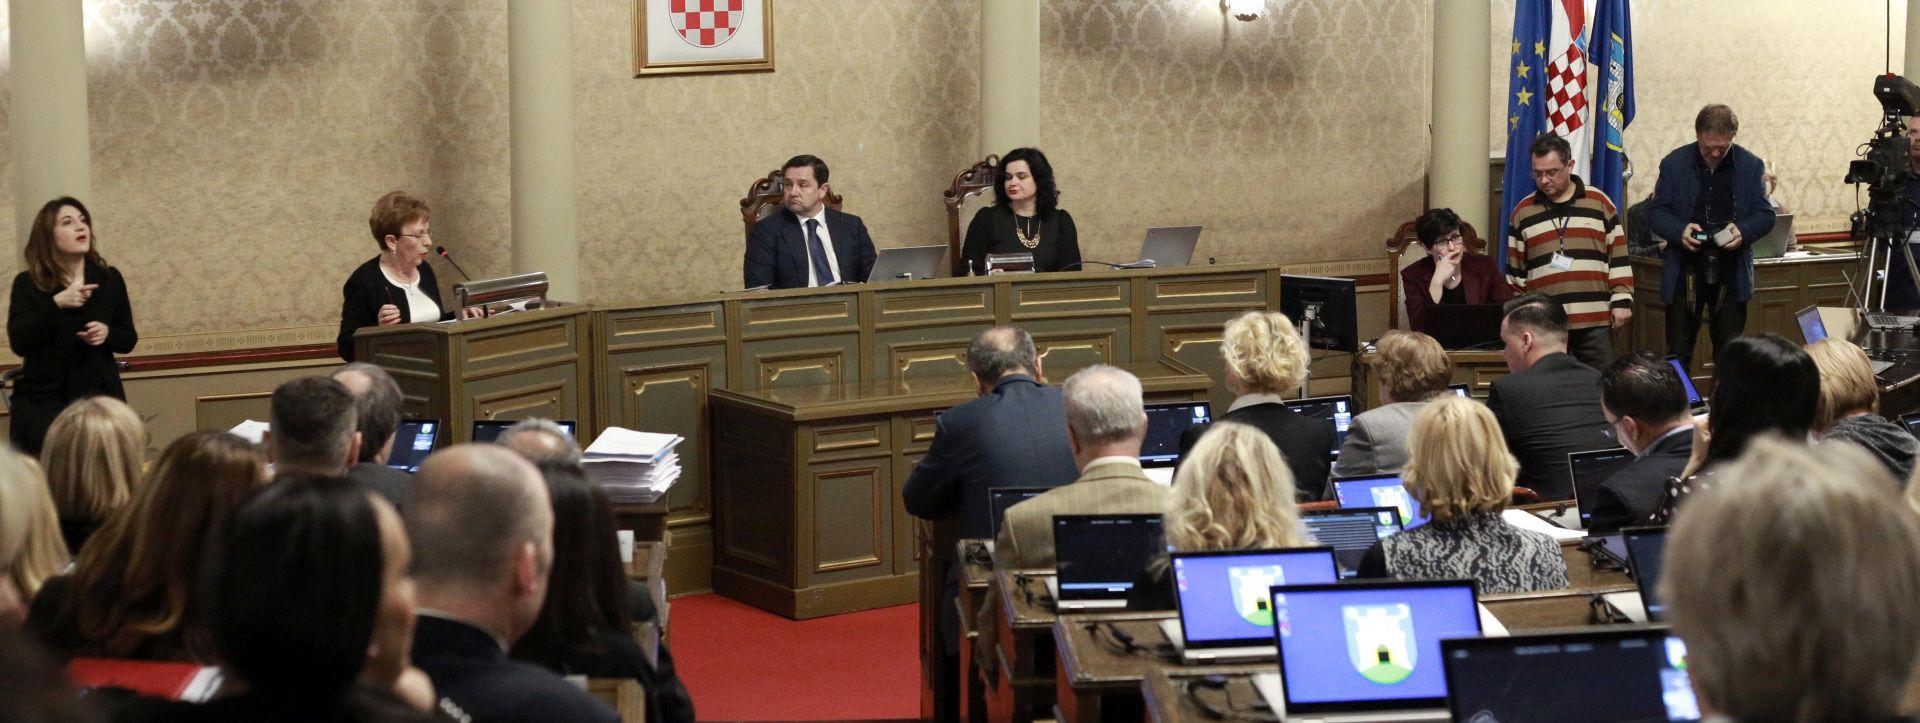 'HDZ će podržati Bandićev prijedlog odluke o otpadu, uz odgodu kazni'